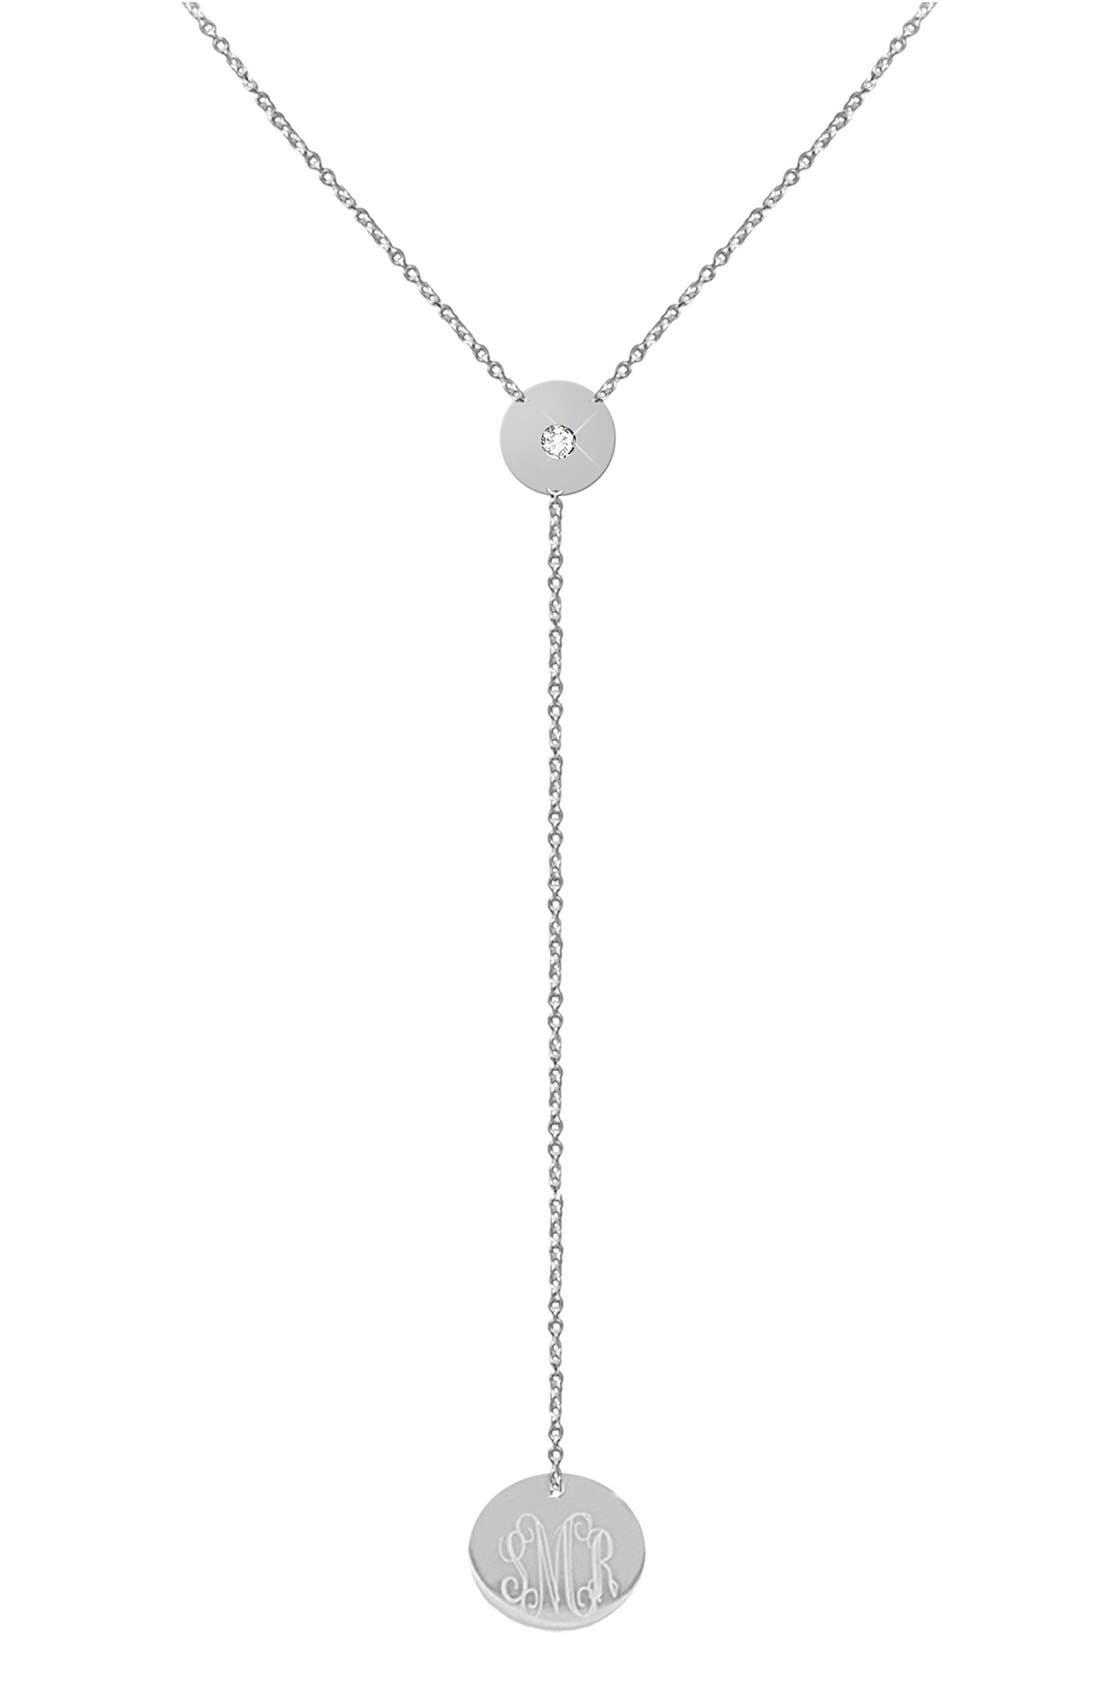 Diamond & Personalized Monogram Y-Necklace,                             Main thumbnail 2, color,